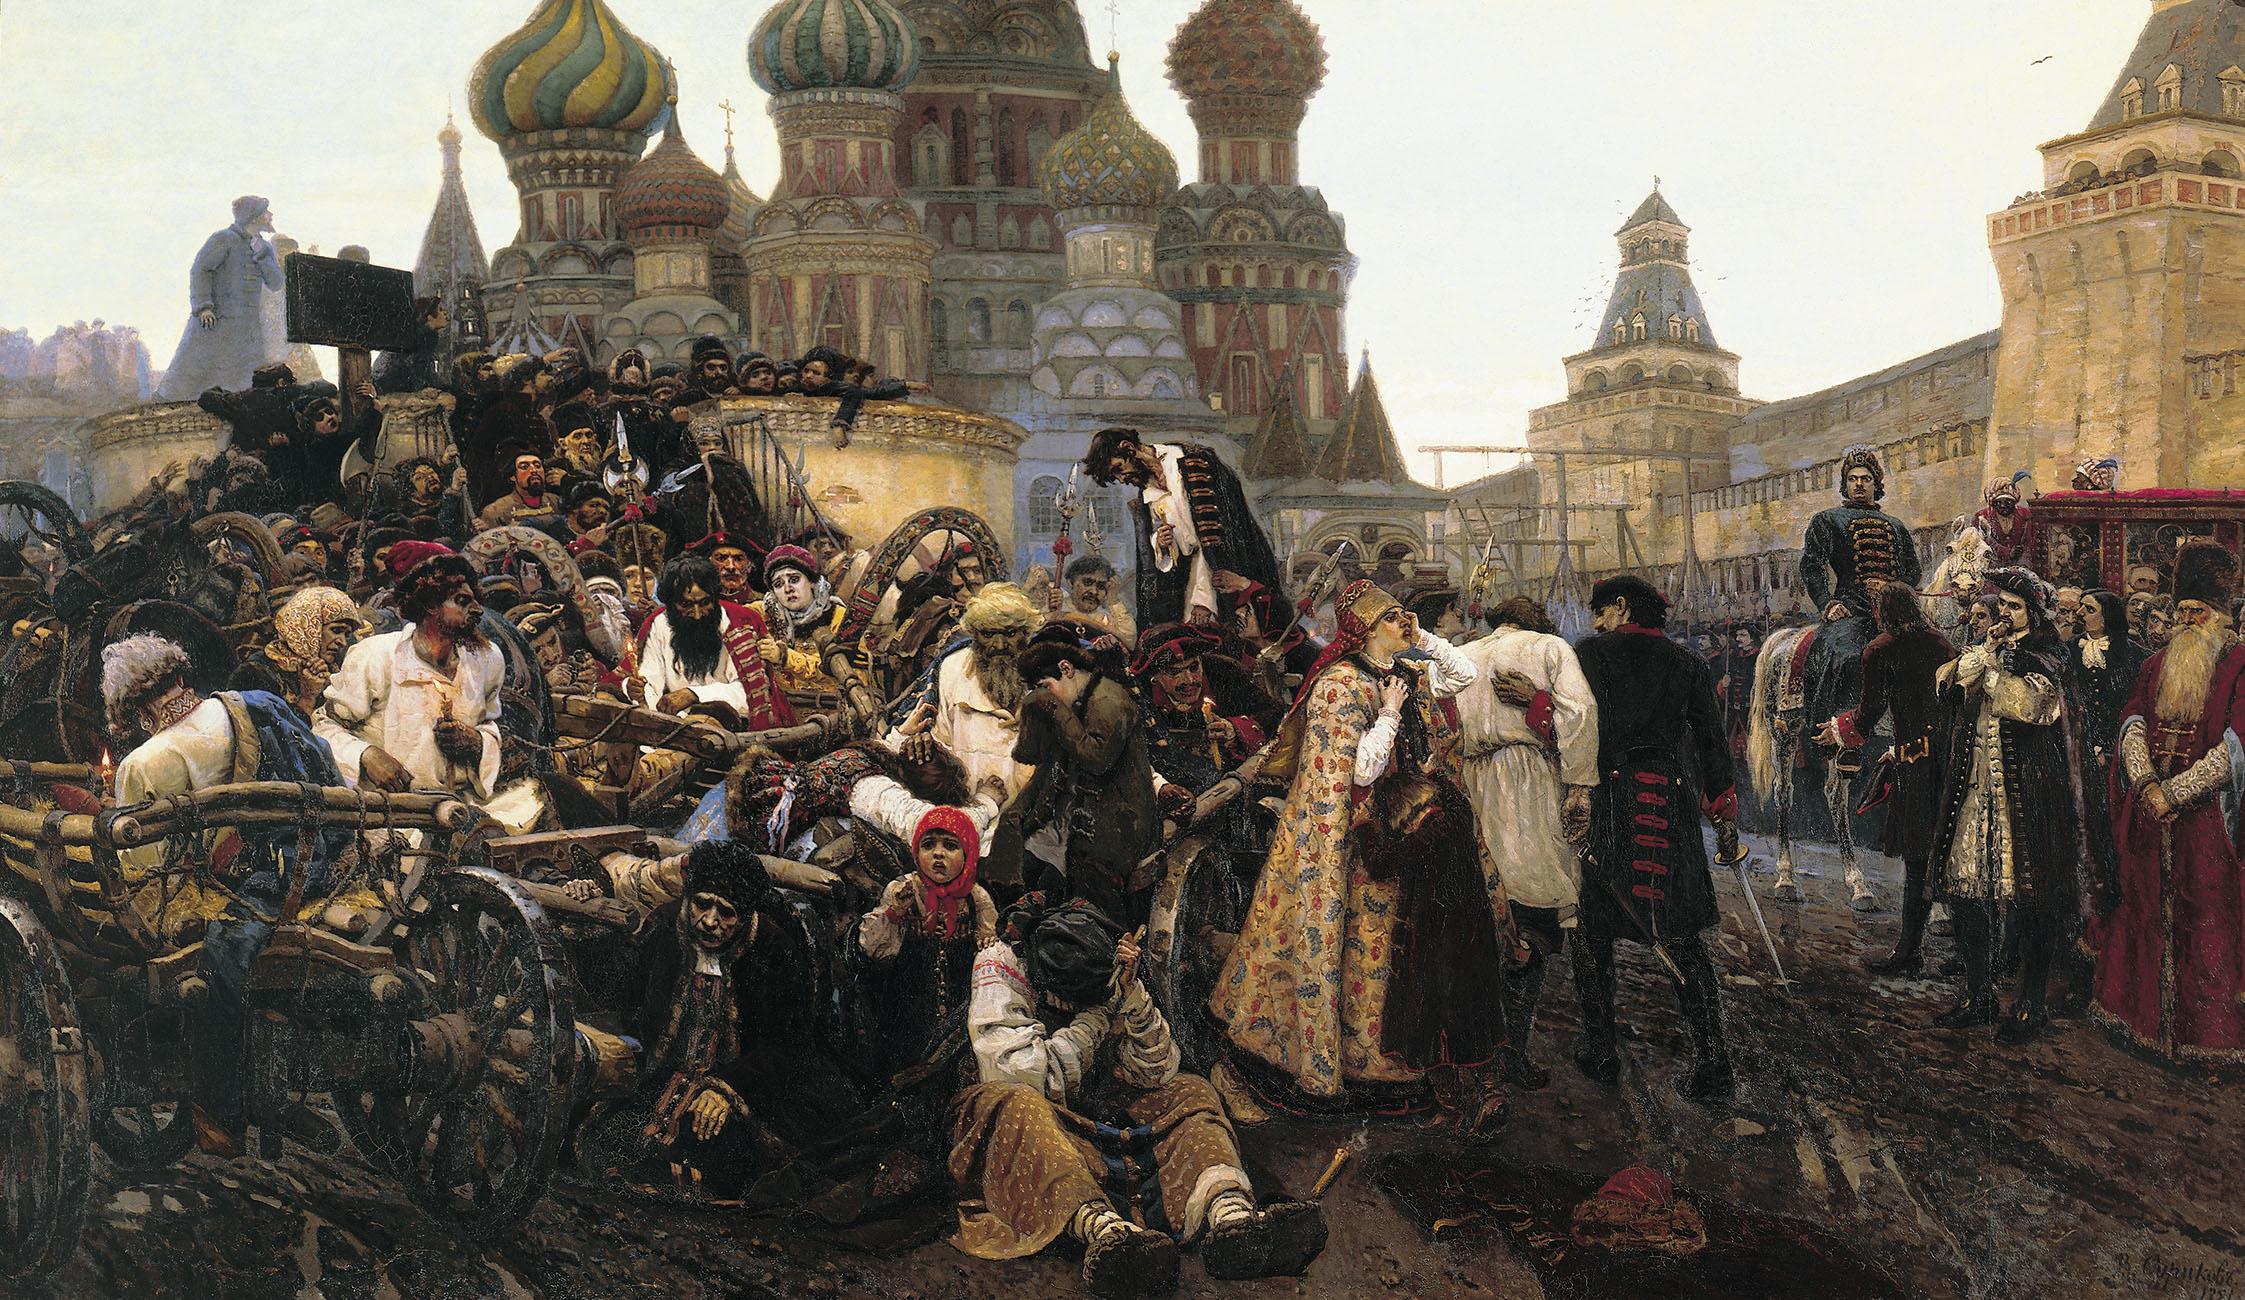 http://rufact.org/media/attachments/wakawaka_wikipage/68/Surikov_streltsi.jpg